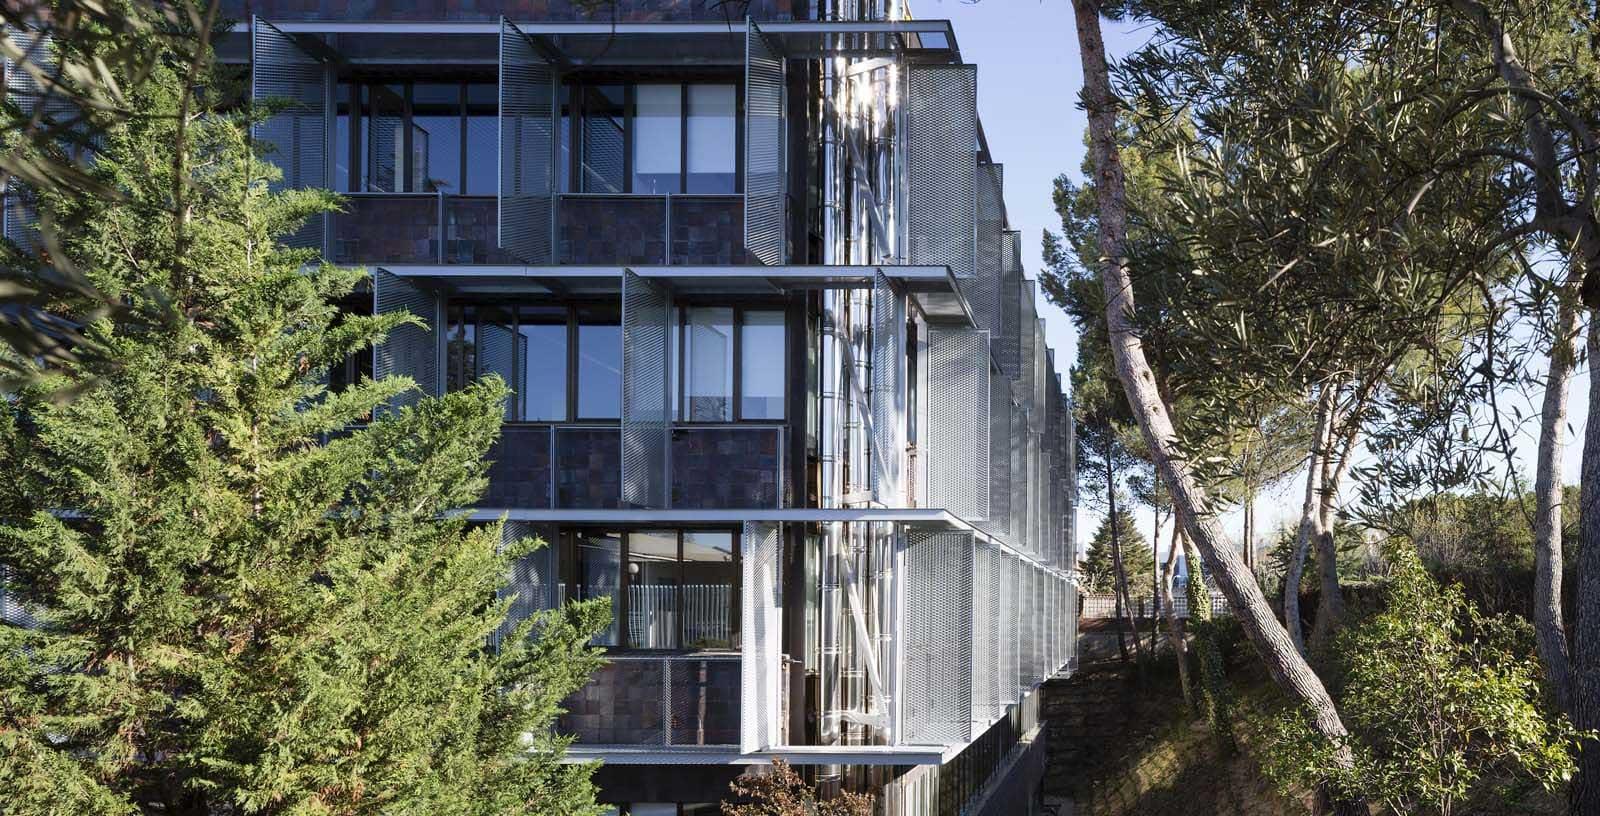 New_ONO_corporate_headquarters_03_Architecture_IDOM_photos_Miguel_de_Guzm_n